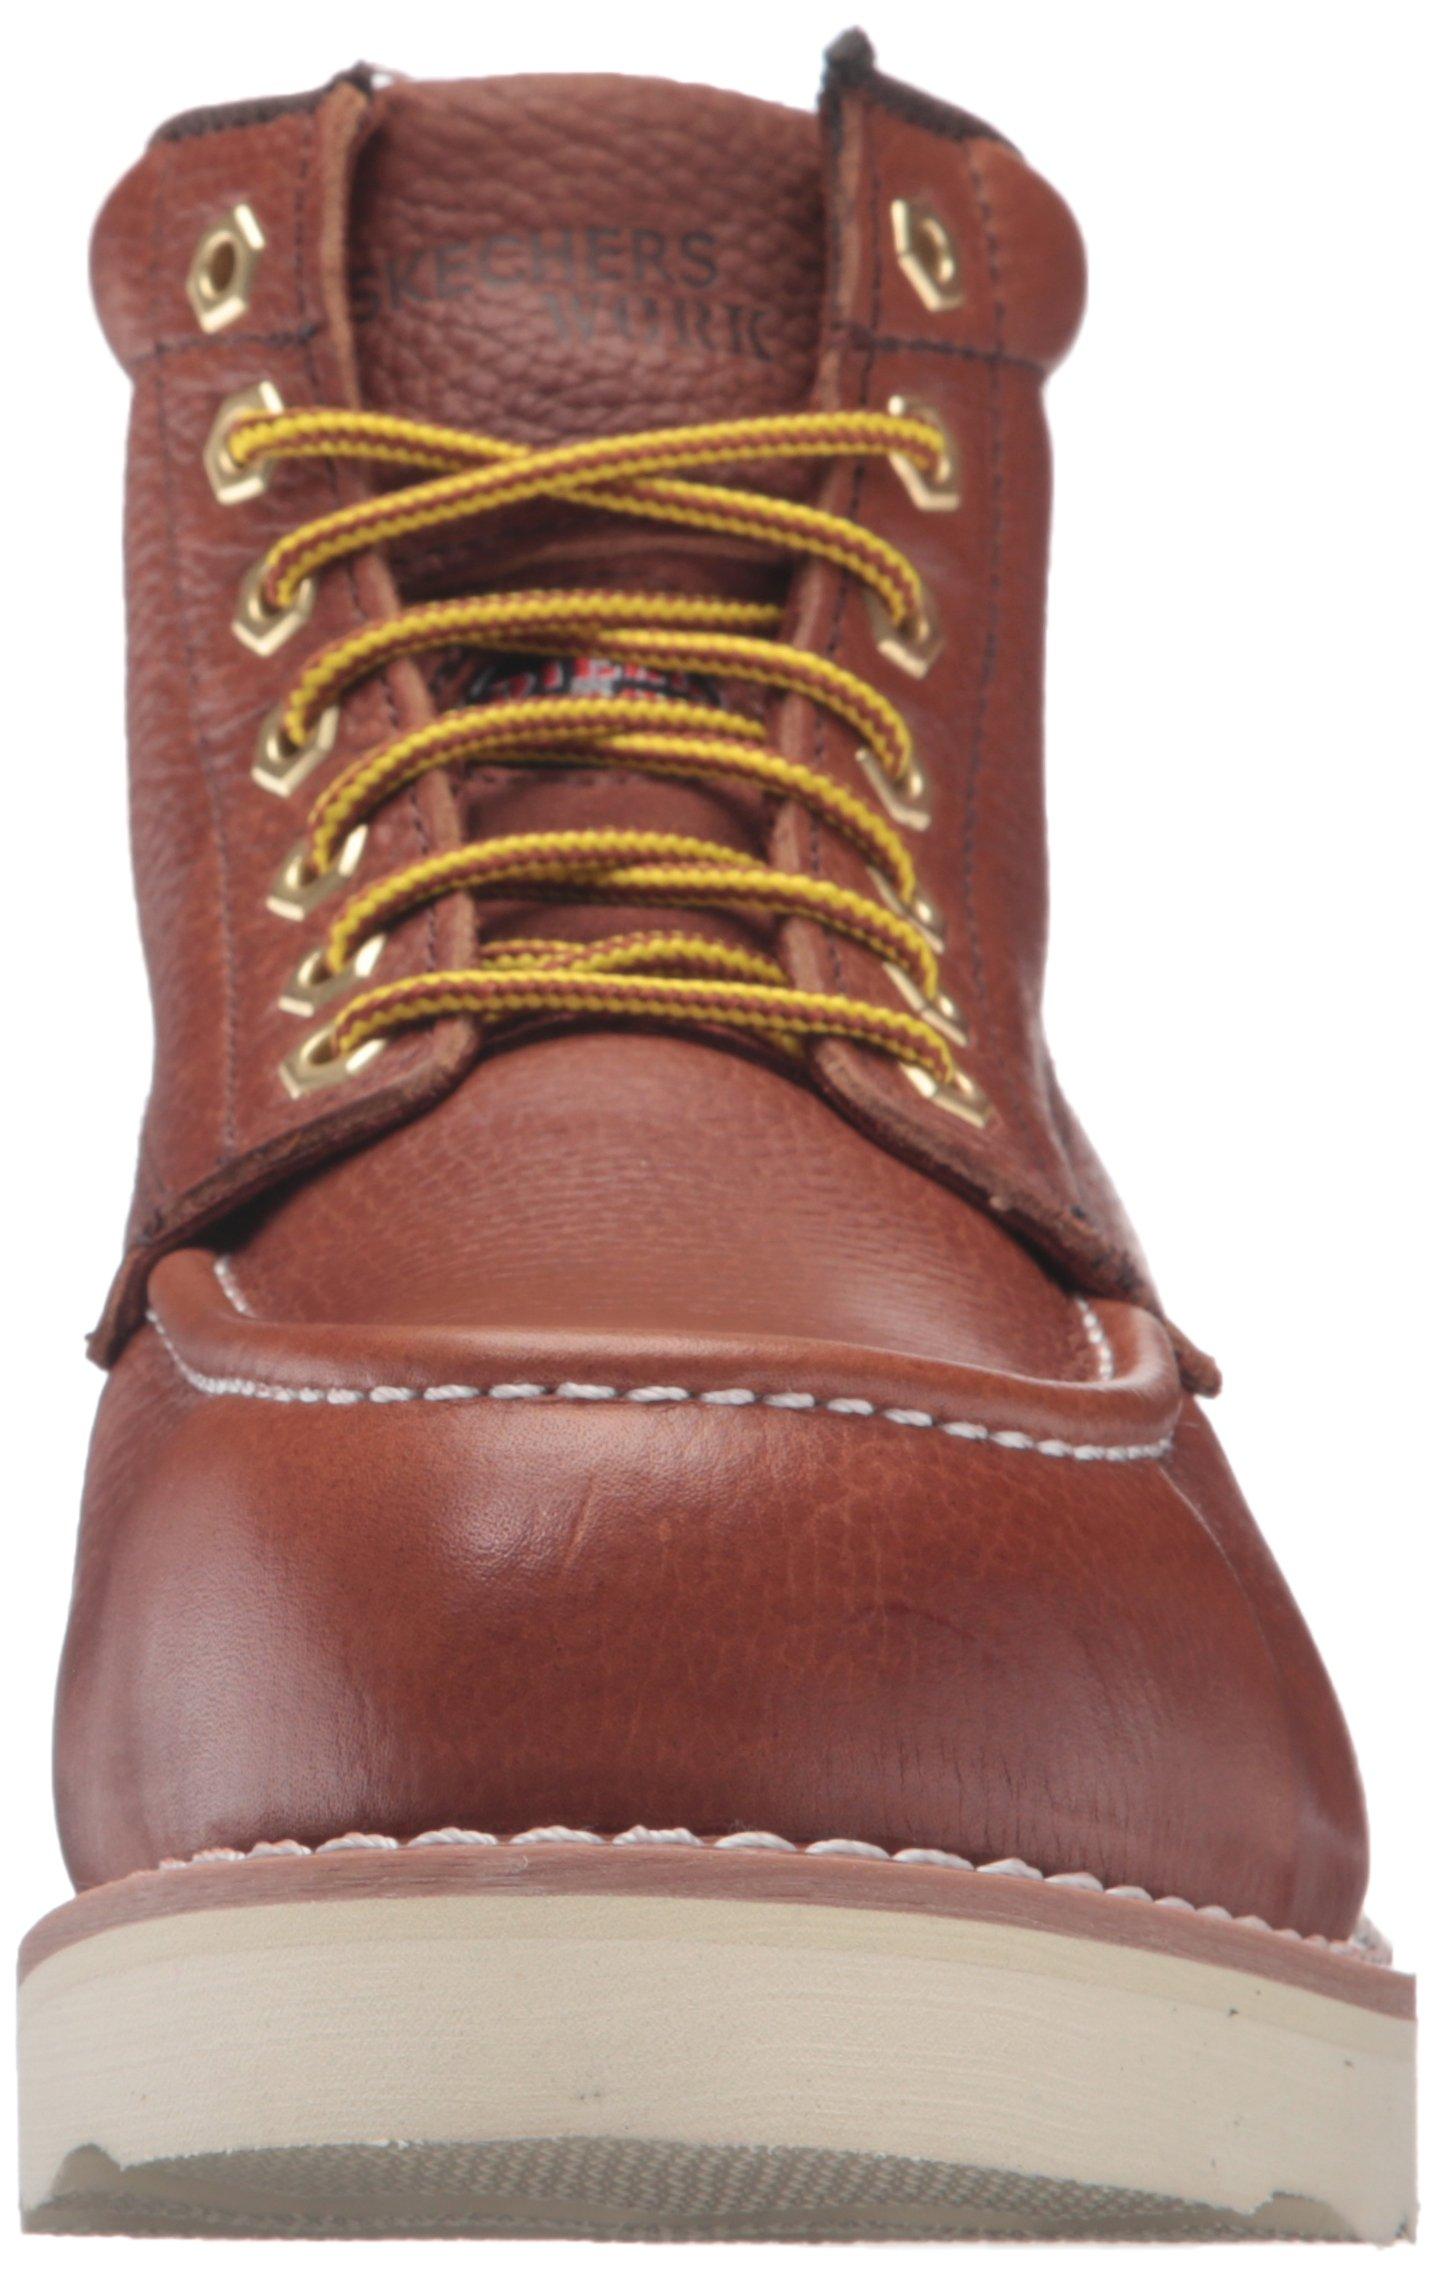 Skechers for Work Men's Pettus Grafford Work Boot,Red Brown,10.5 M US by Skechers (Image #4)